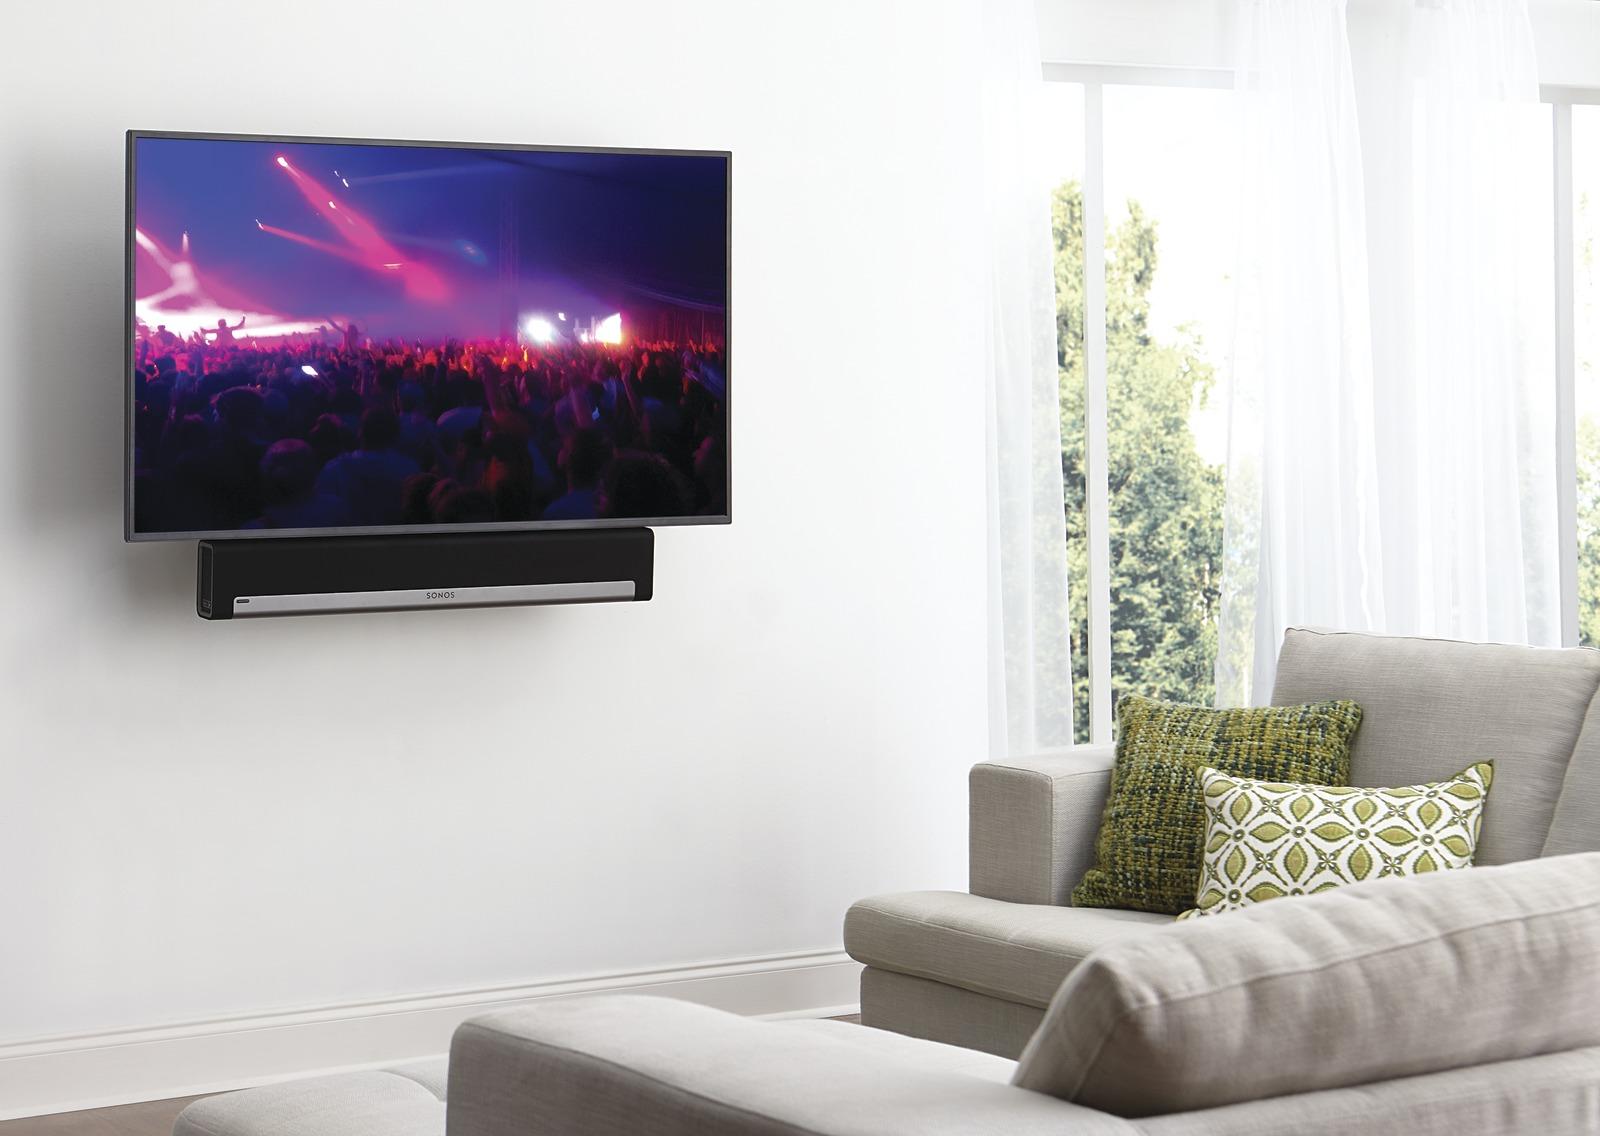 soundbar mounted below TV